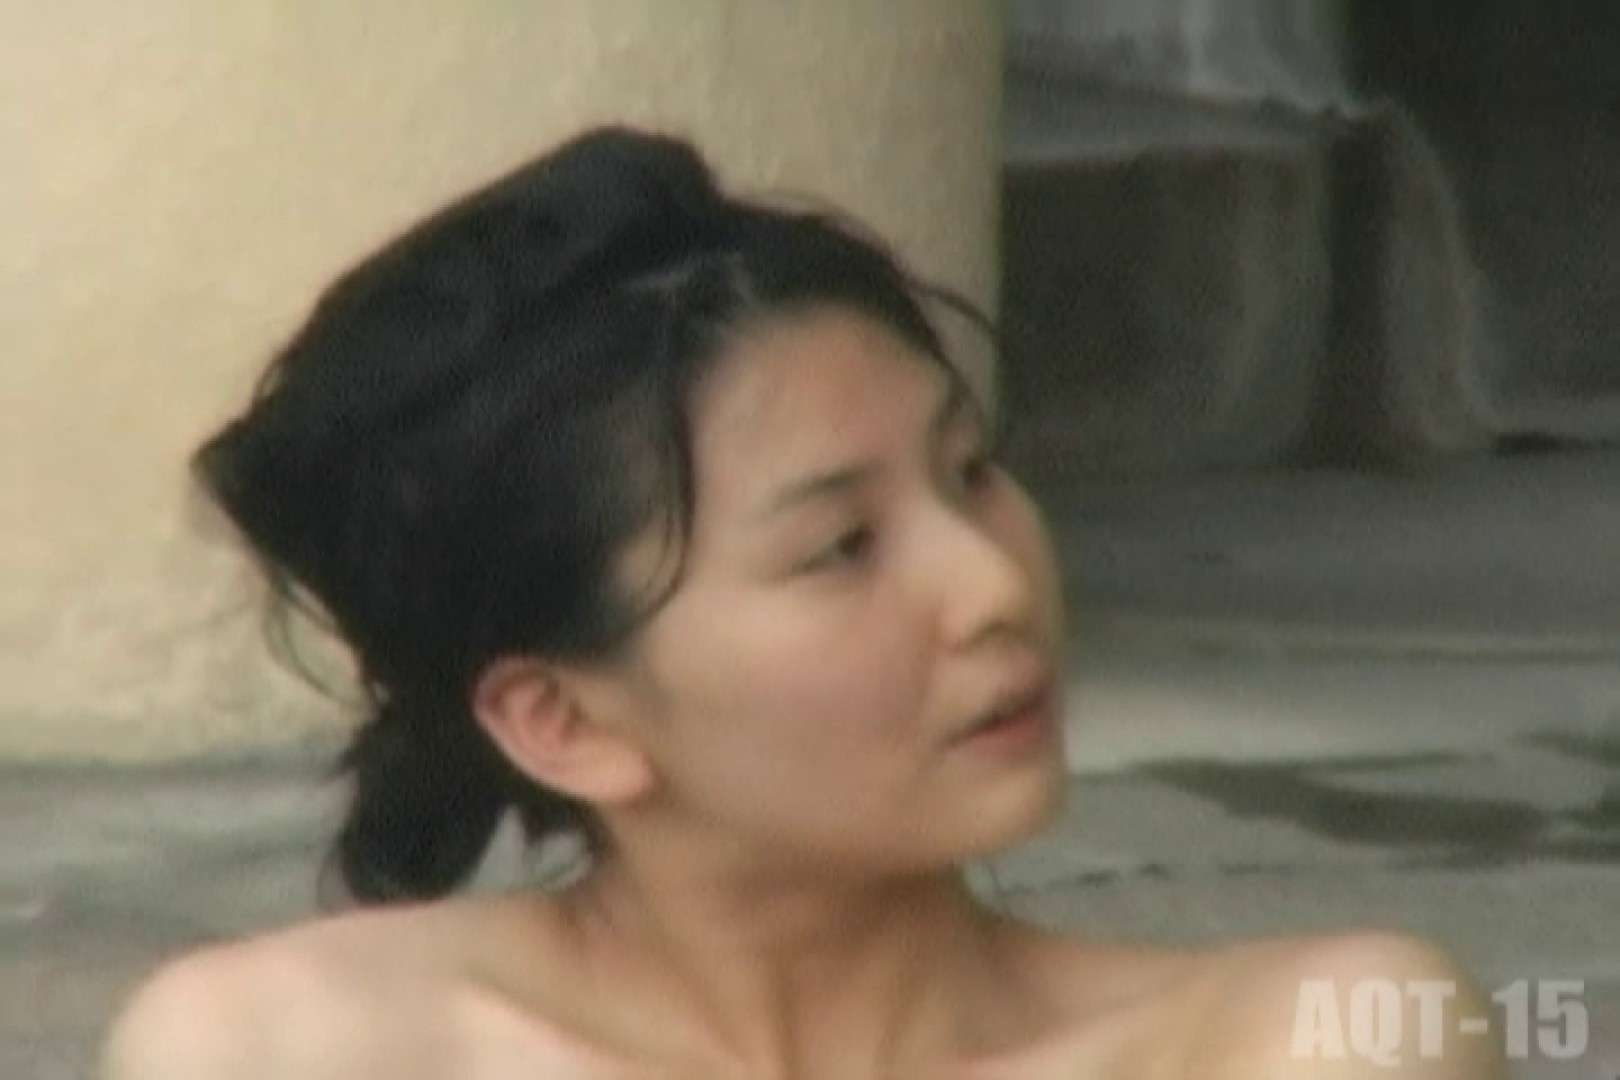 Aquaな露天風呂Vol.832 美しいOLの裸体 戯れ無修正画像 99pic 11